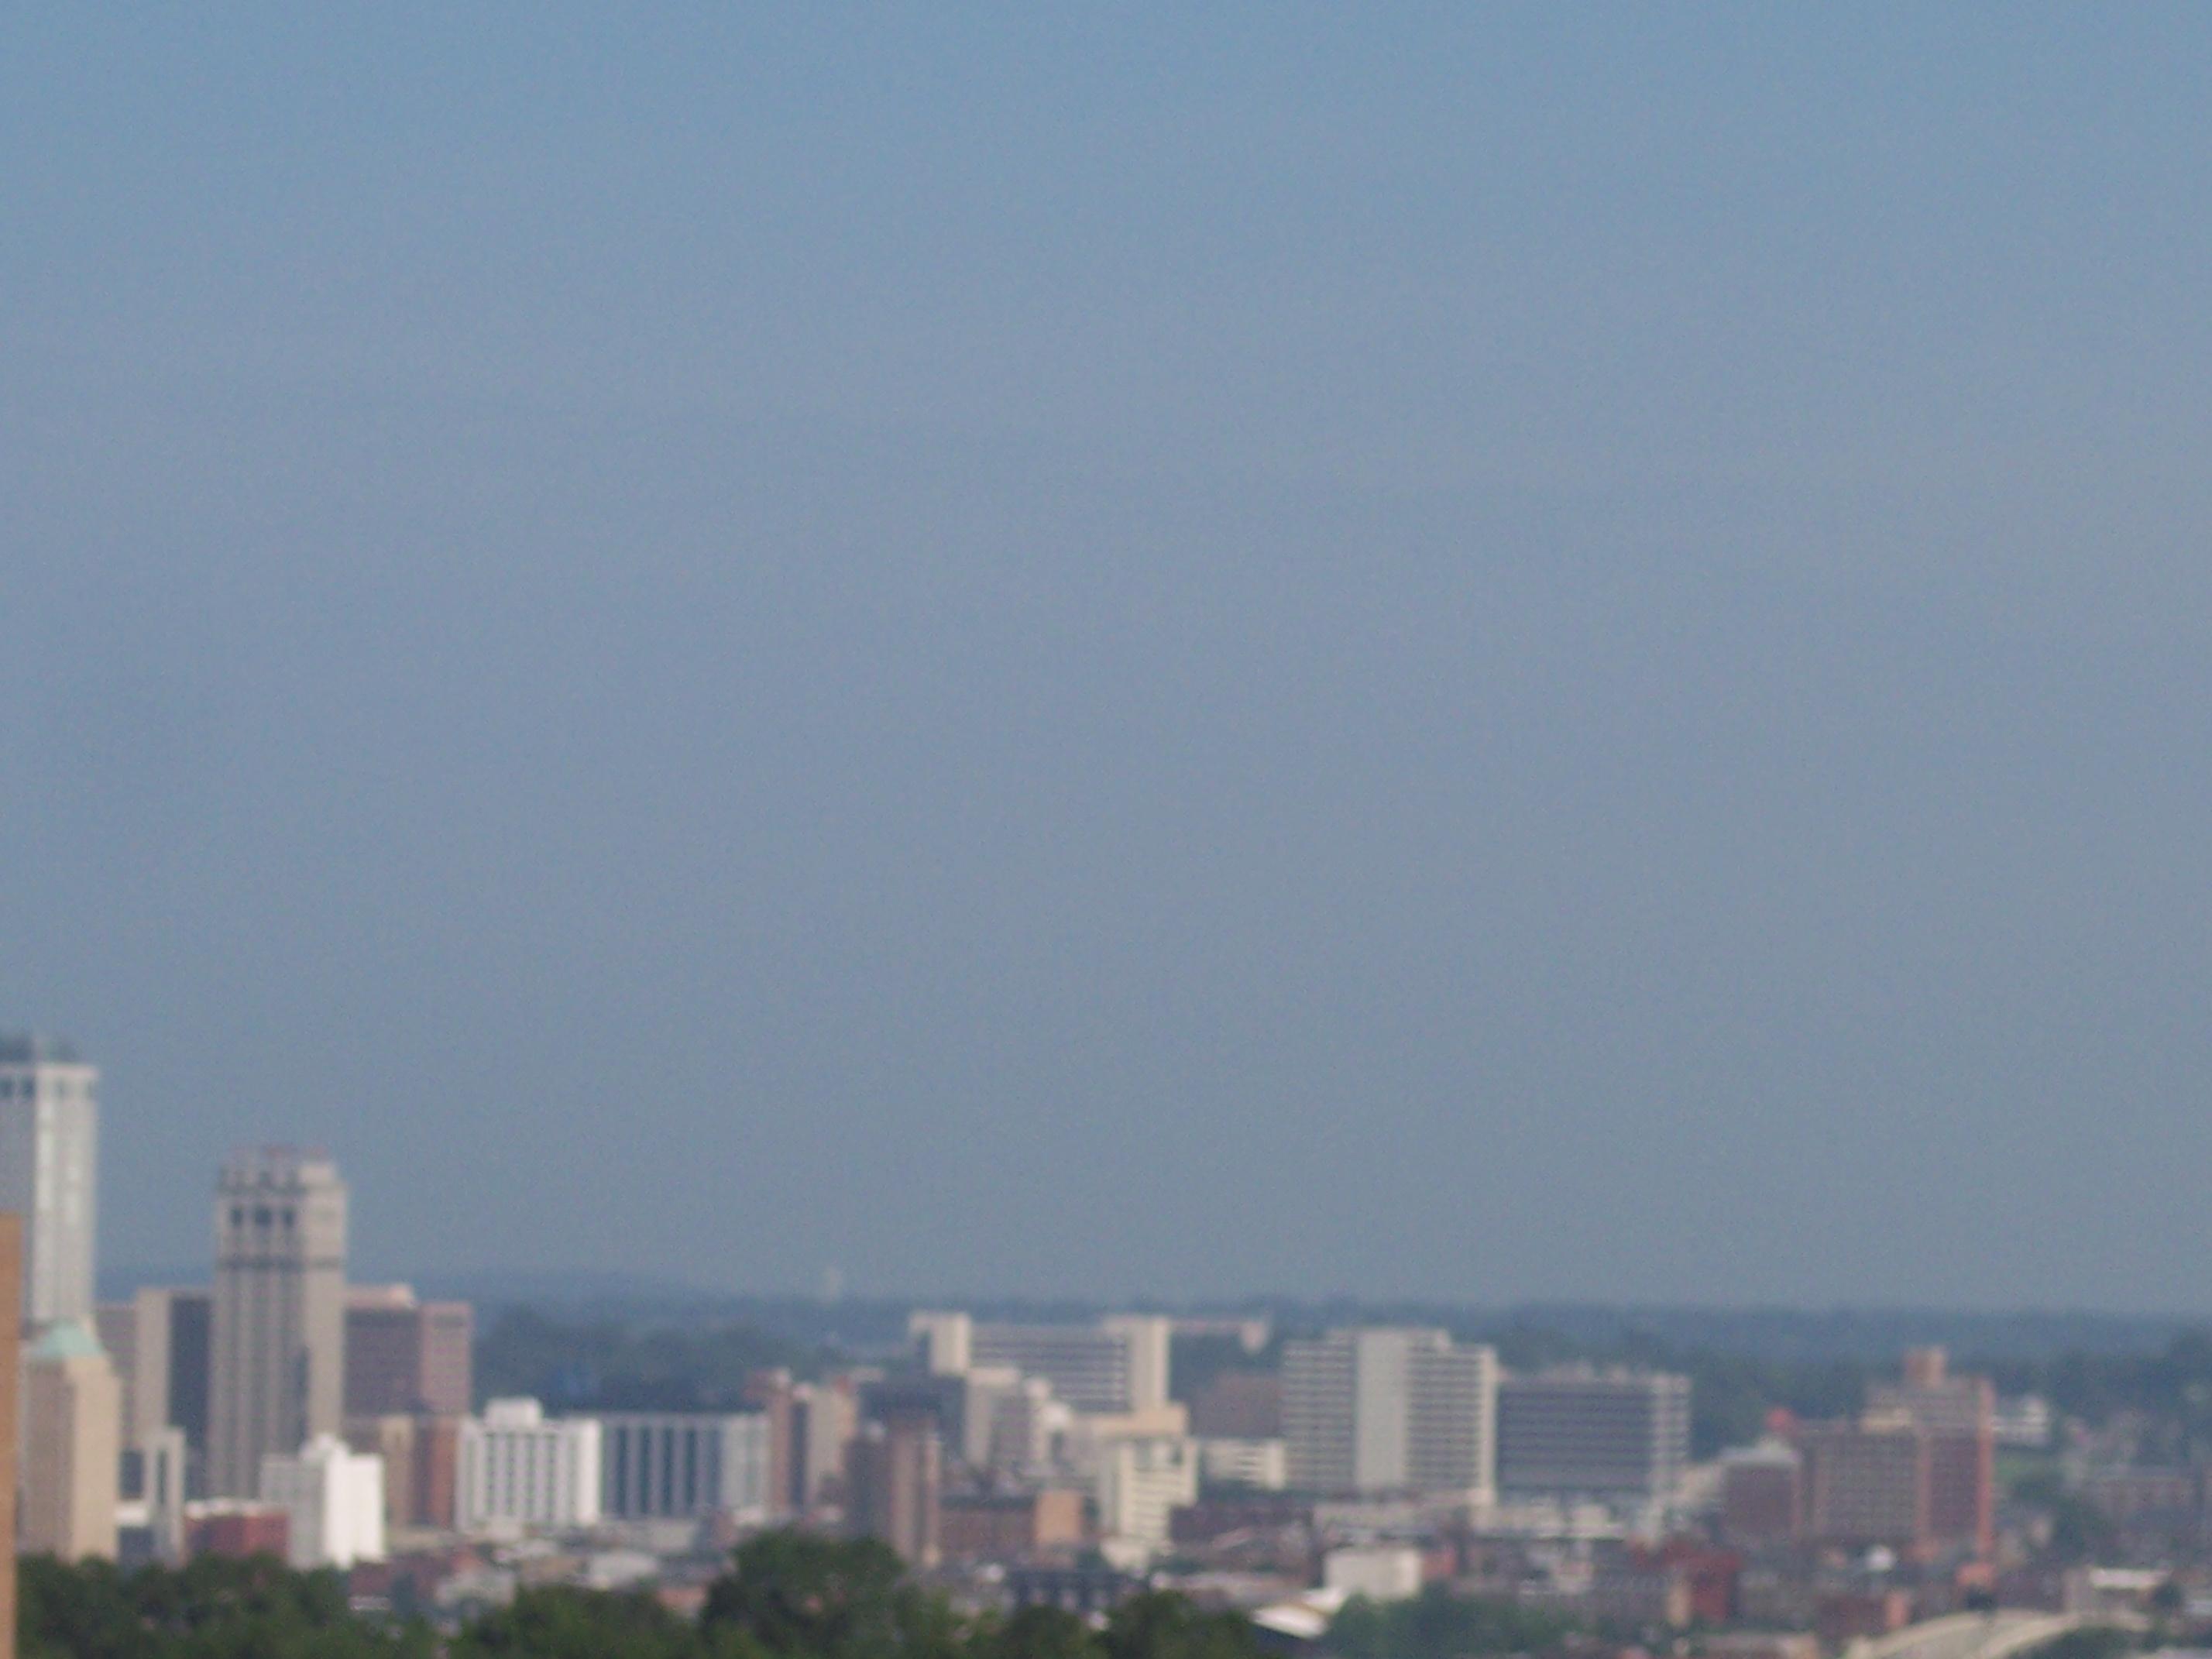 Caption: Birmingham, Alabama